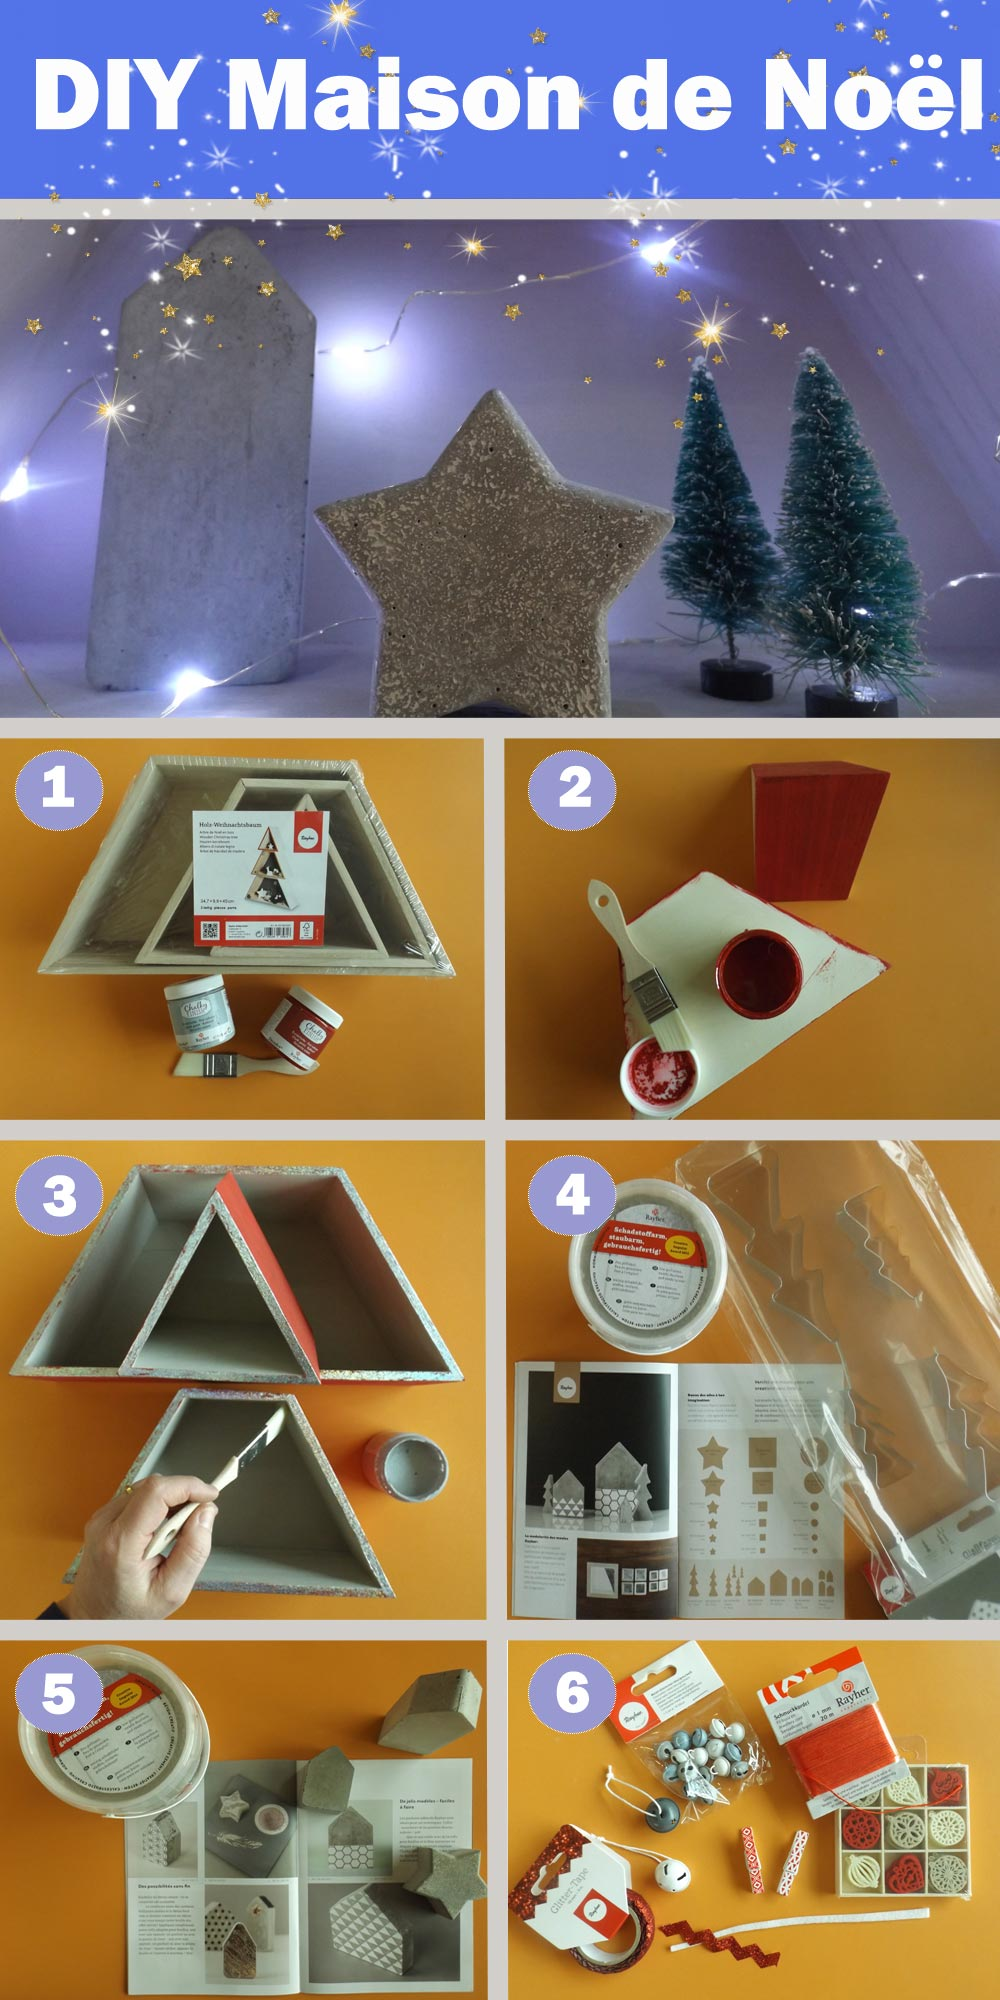 DIY Maison de Noël